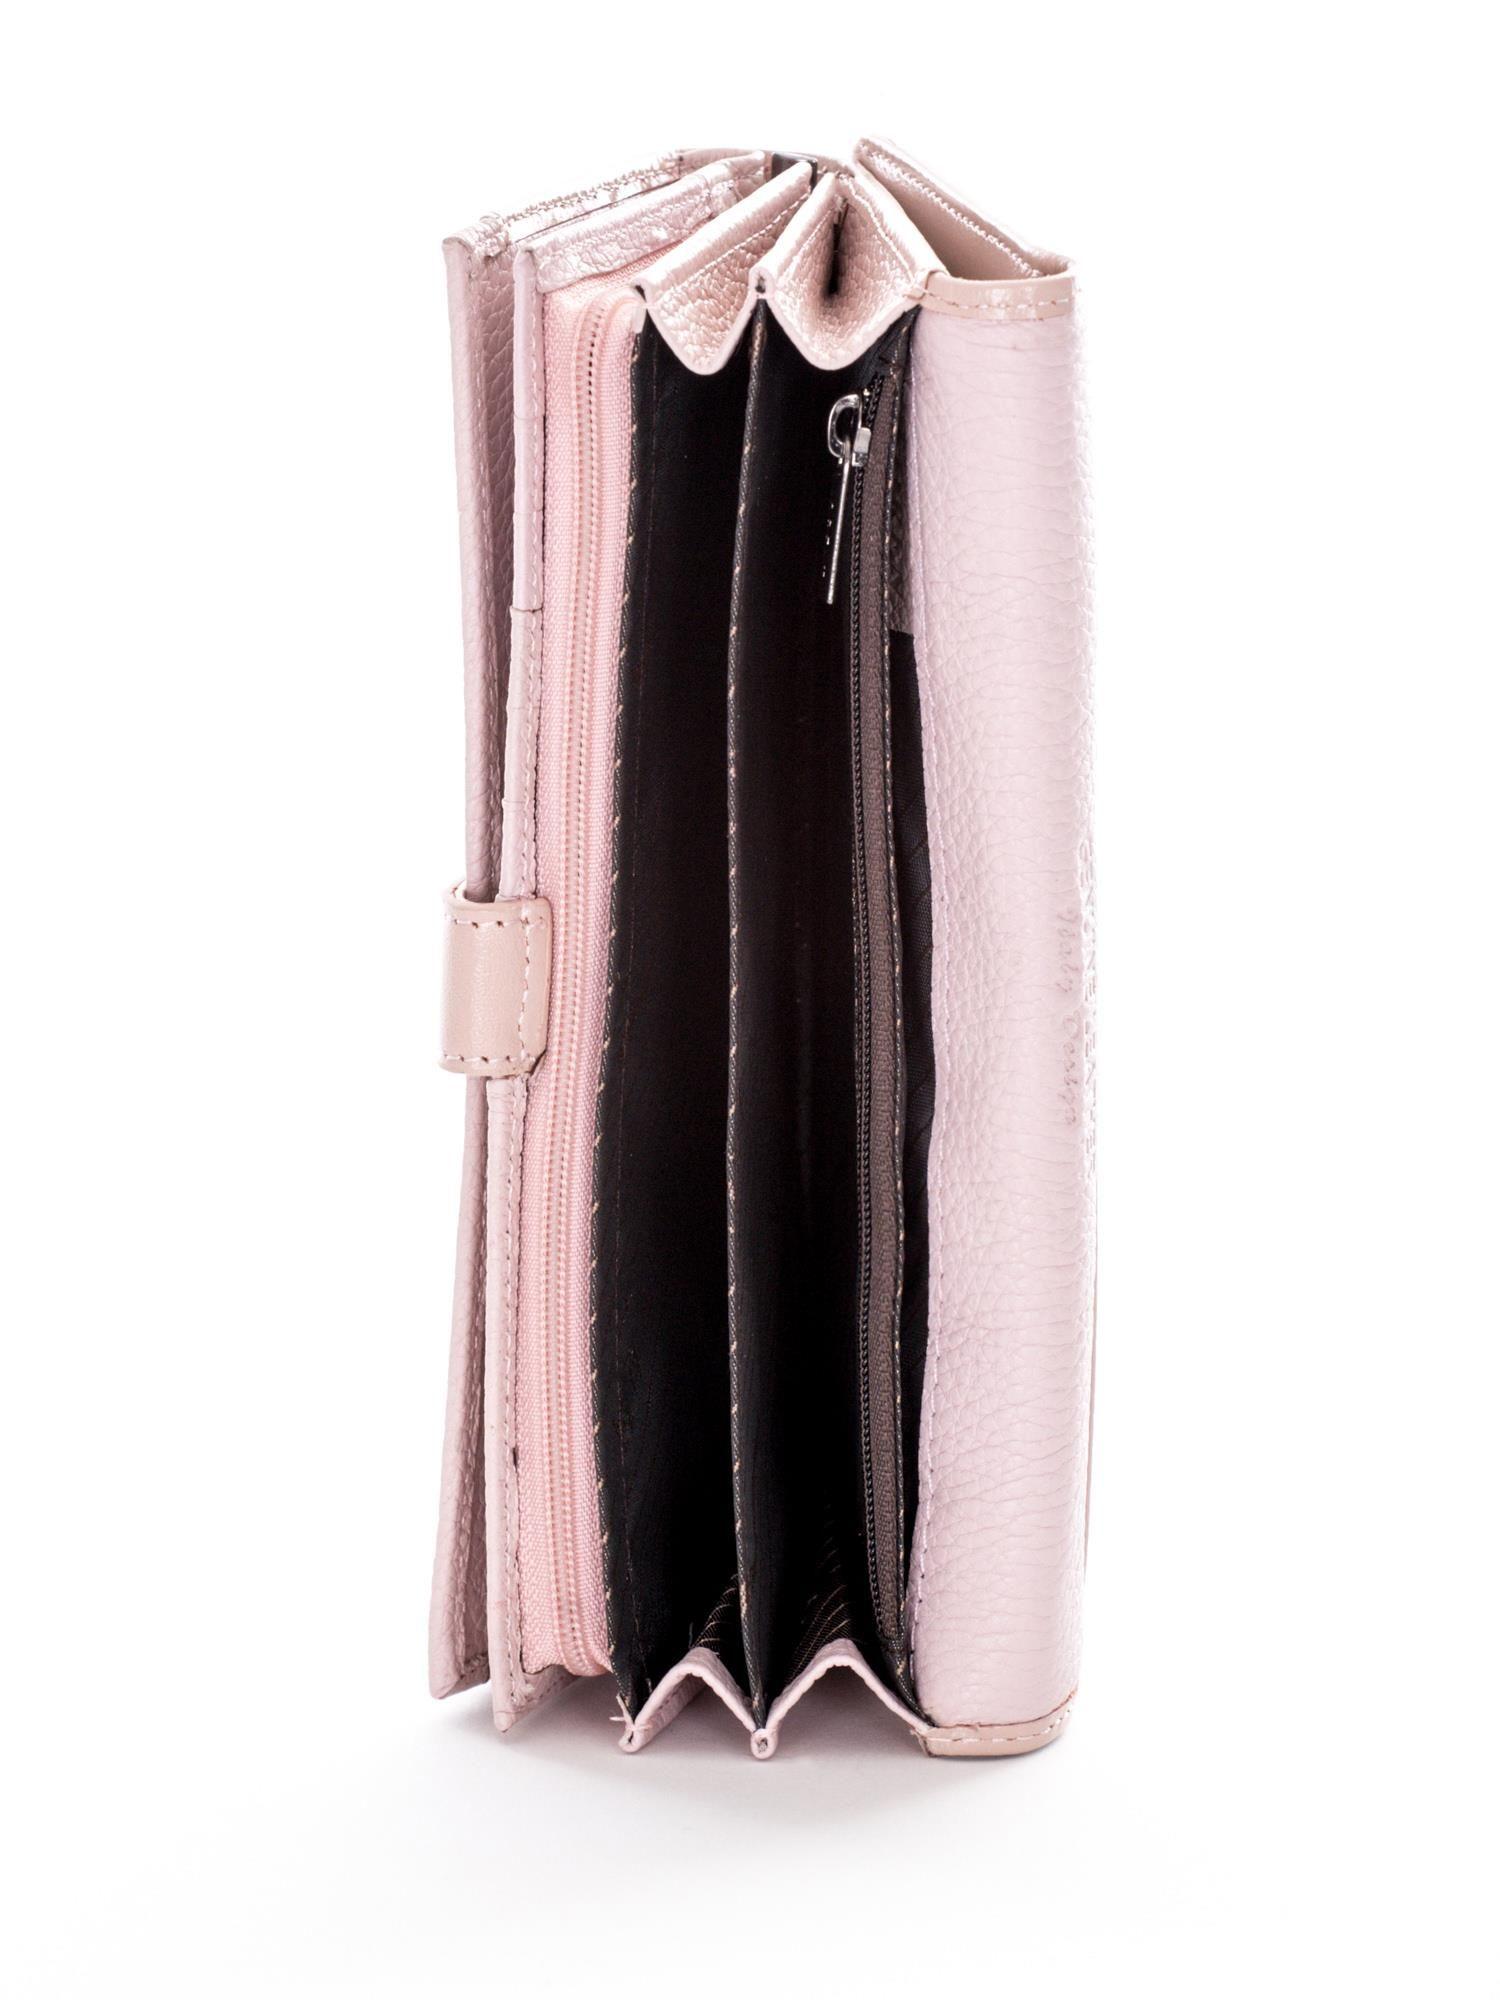 Elegancki portfel damski ze skóry ekologicznej P21